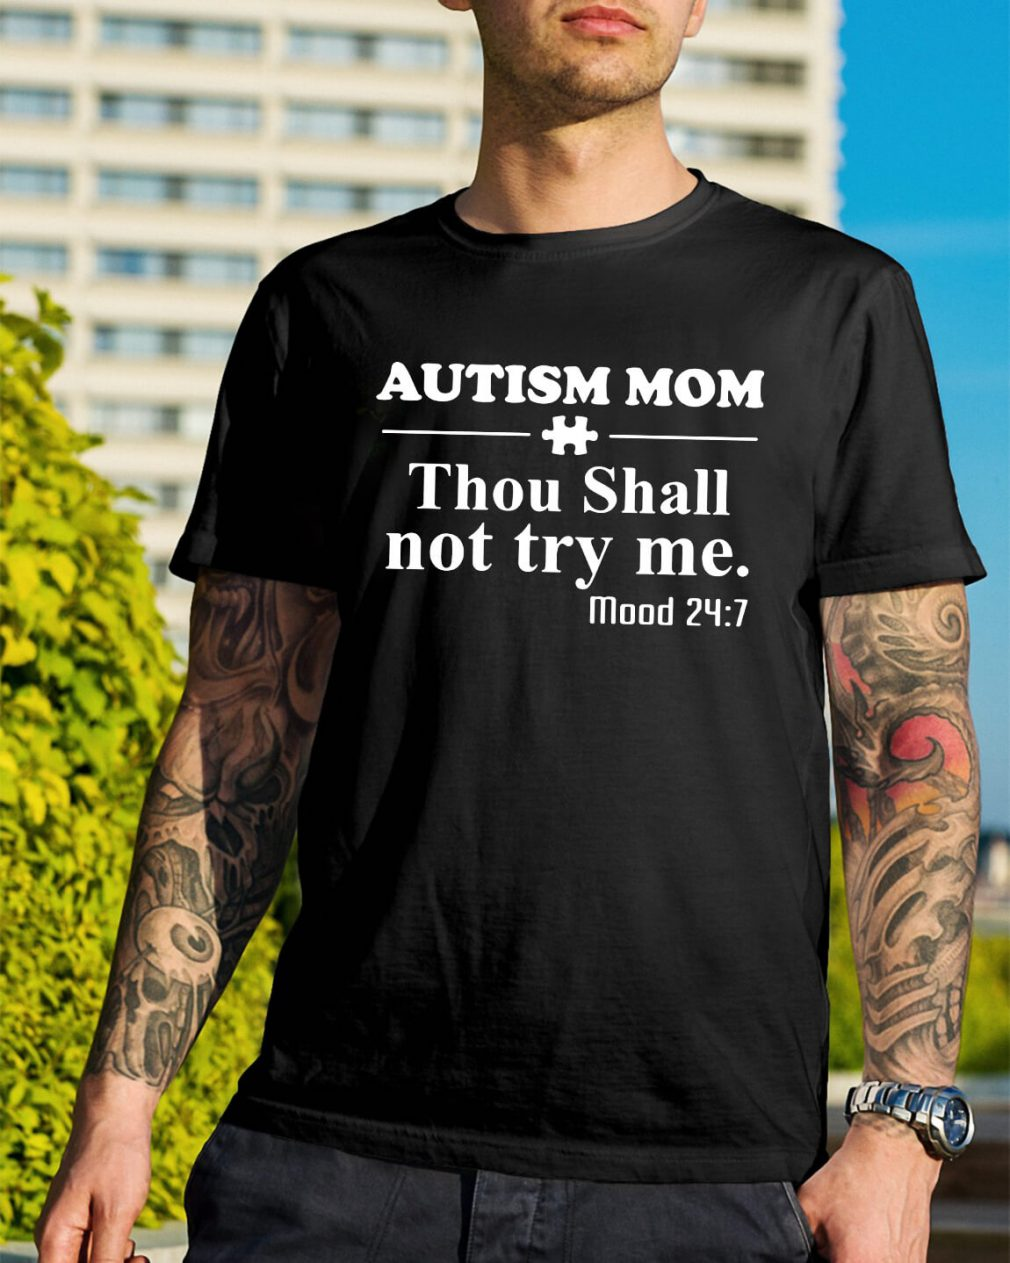 Autism mom thou shall not try me mood 24:7 shirt